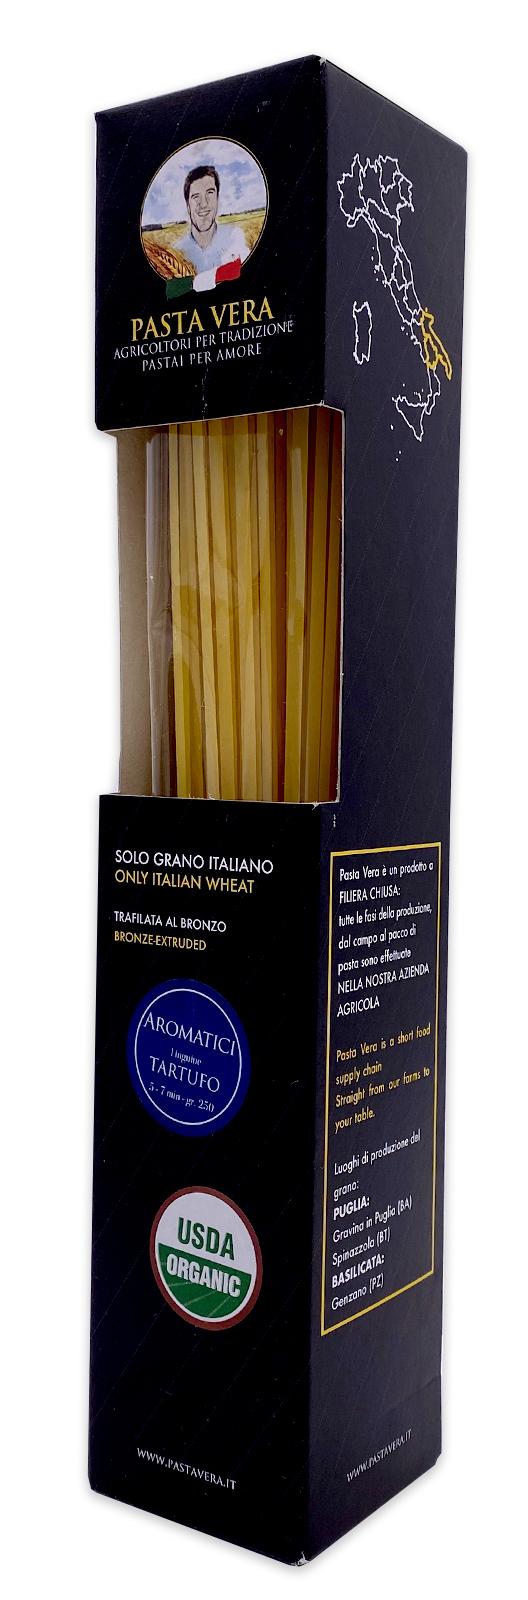 Pasta Vera Italian Organic Tartufo Truffle Linguine 03